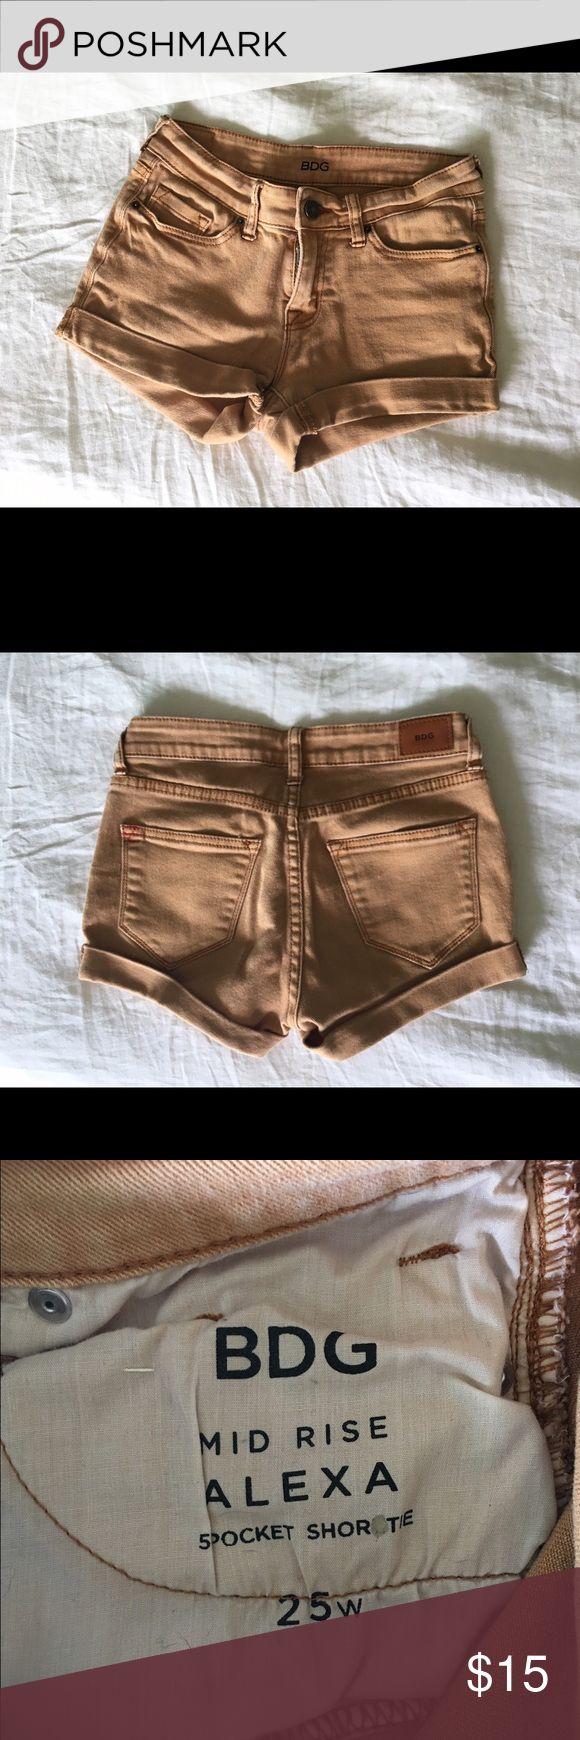 Mustard Jean BDG shorts BDG 'mid-rise Alexa' mustard Jean colored shorts size 25 BDG Shorts Jean Shorts